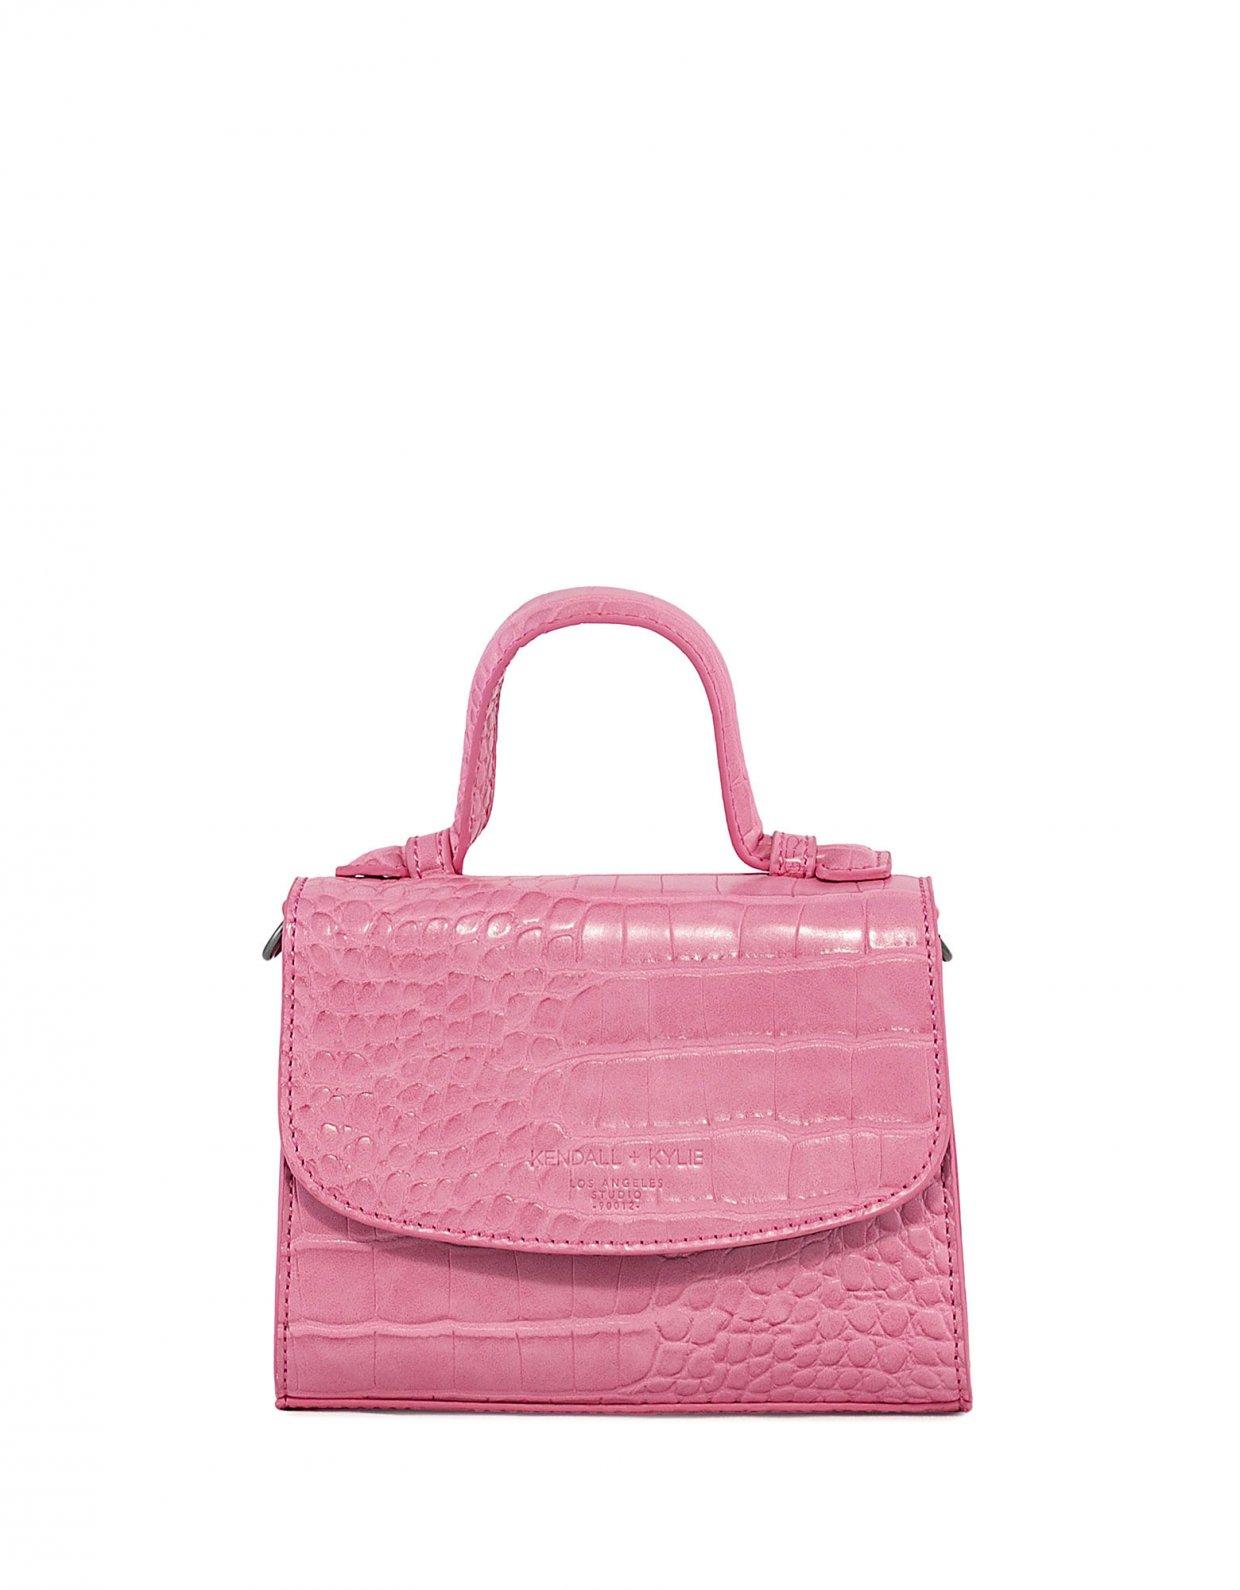 Kendall + Kylie Bae mini crossbody pink croco